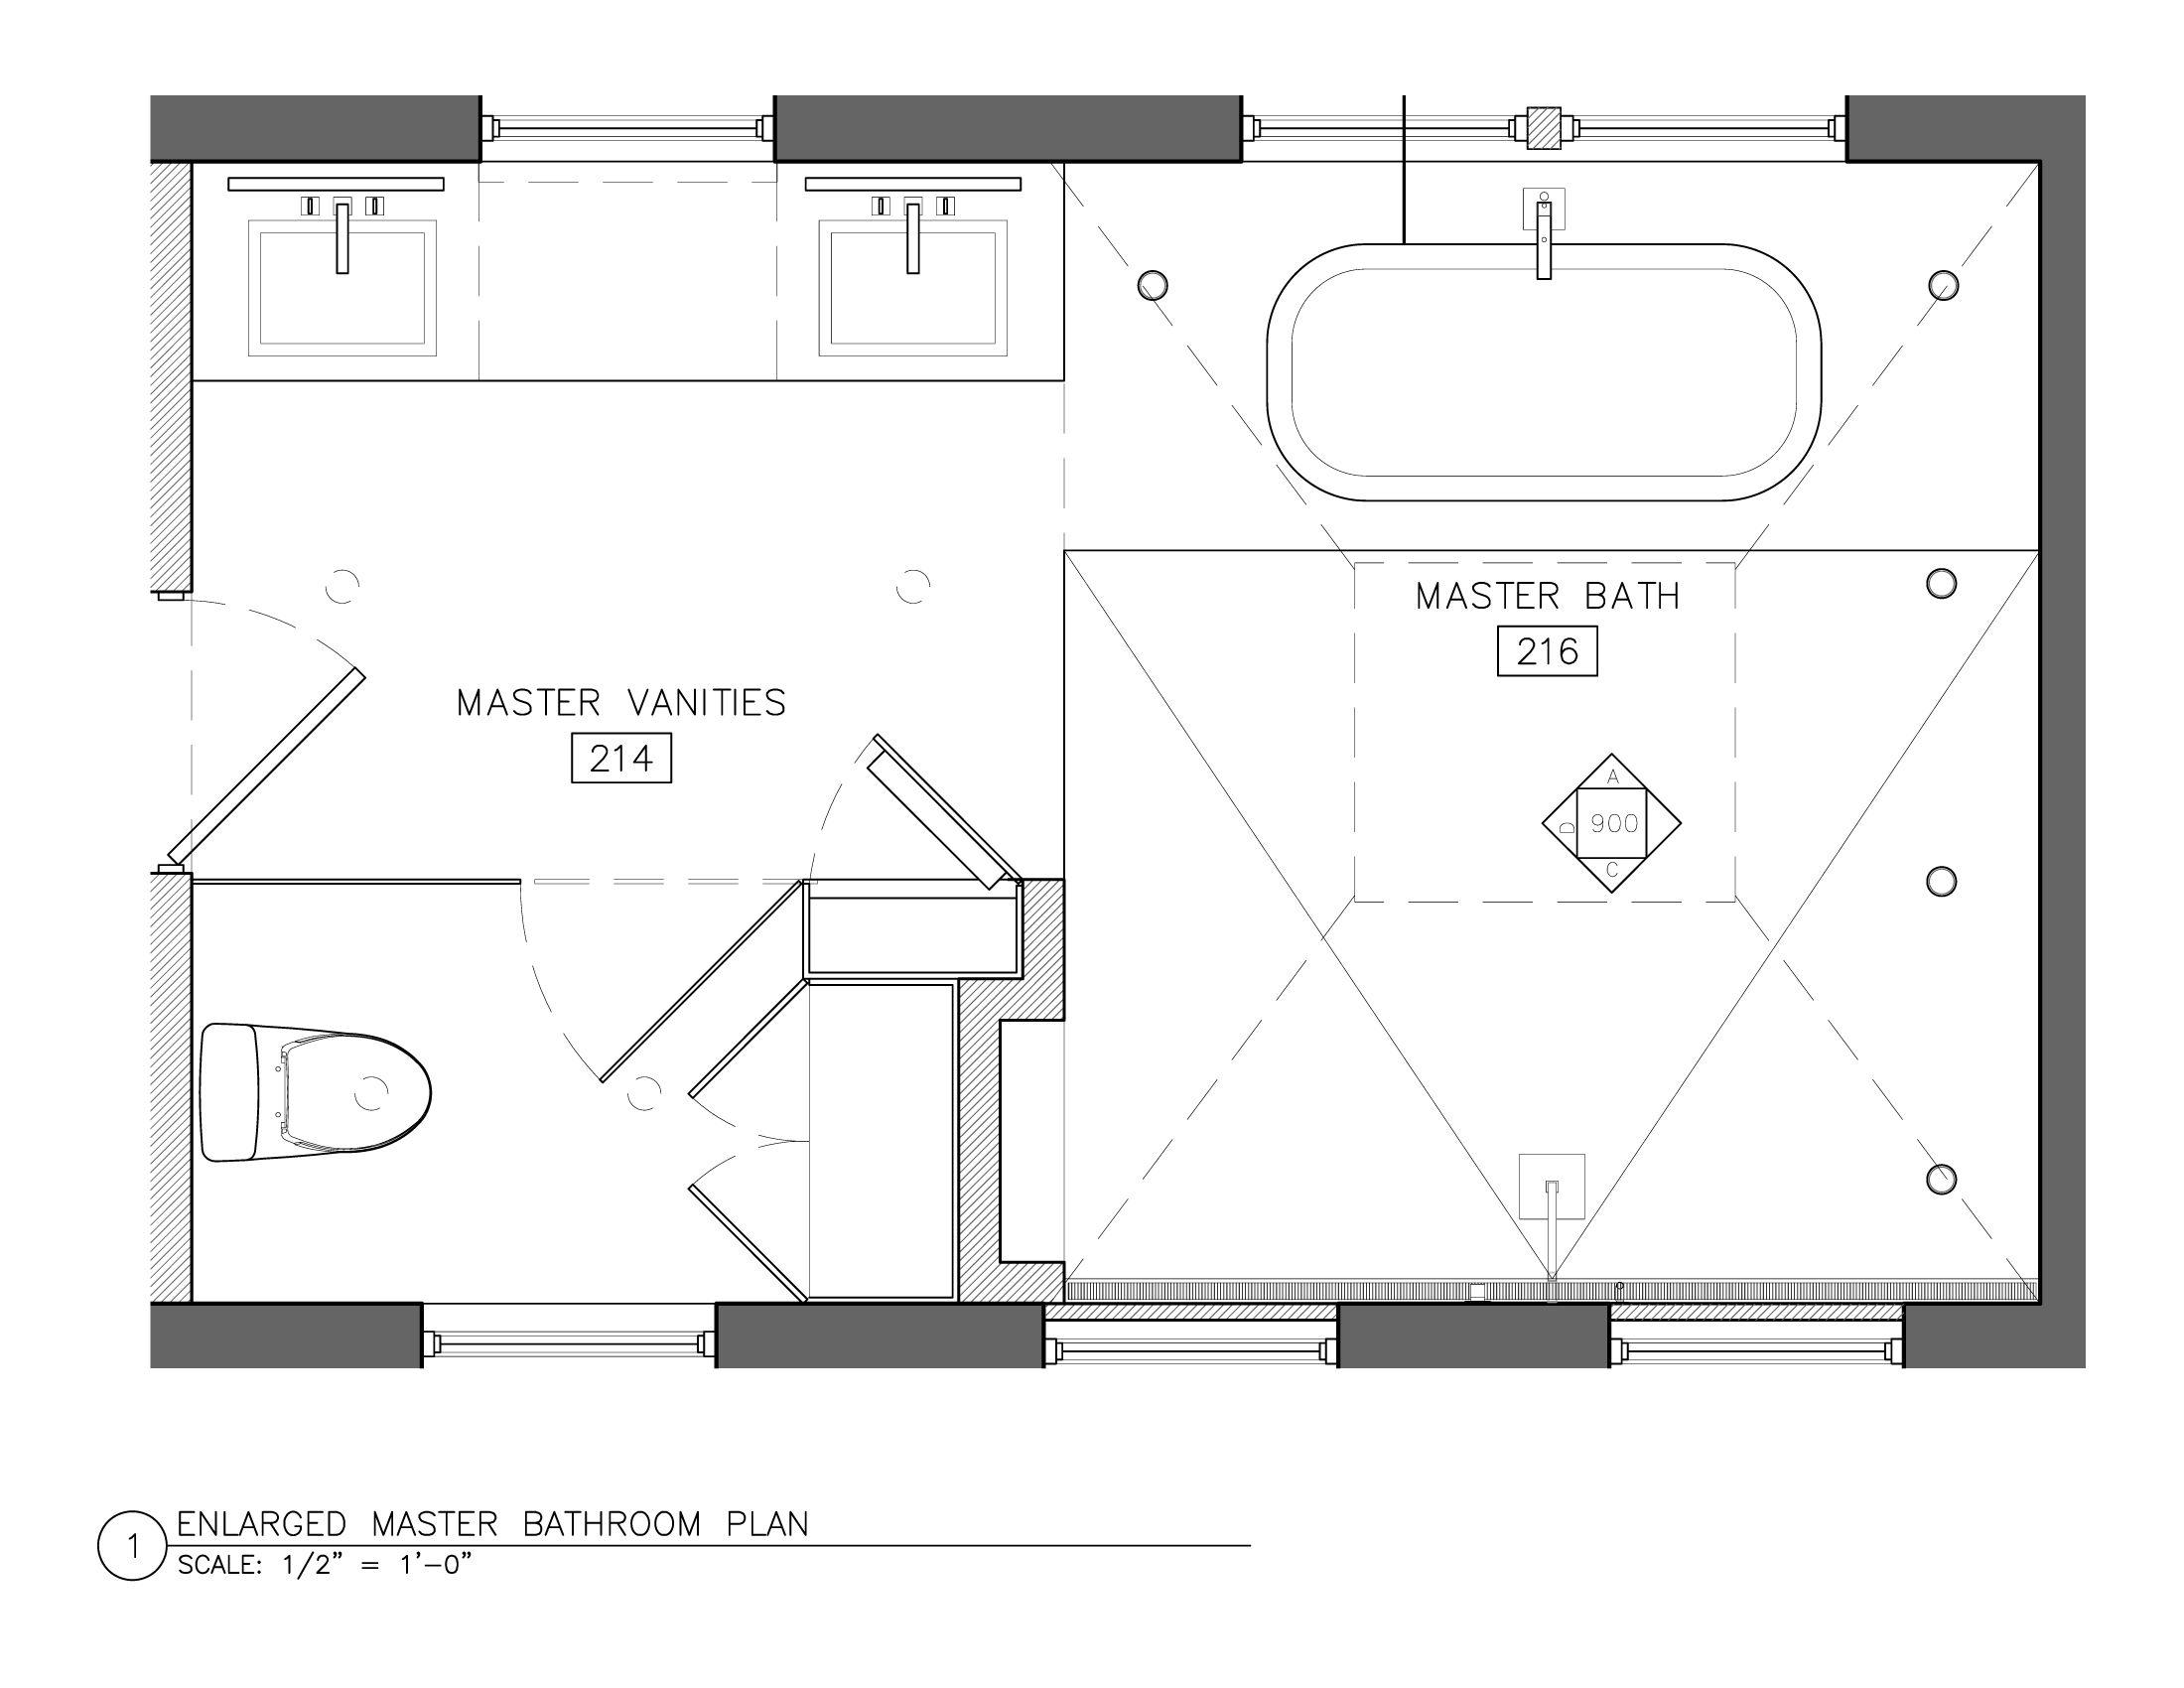 Behind The Scenes Bathroom Battles Cont Vicente Wolf Master Bath Layout Bathroom Layout Plans Master Bathroom Plans